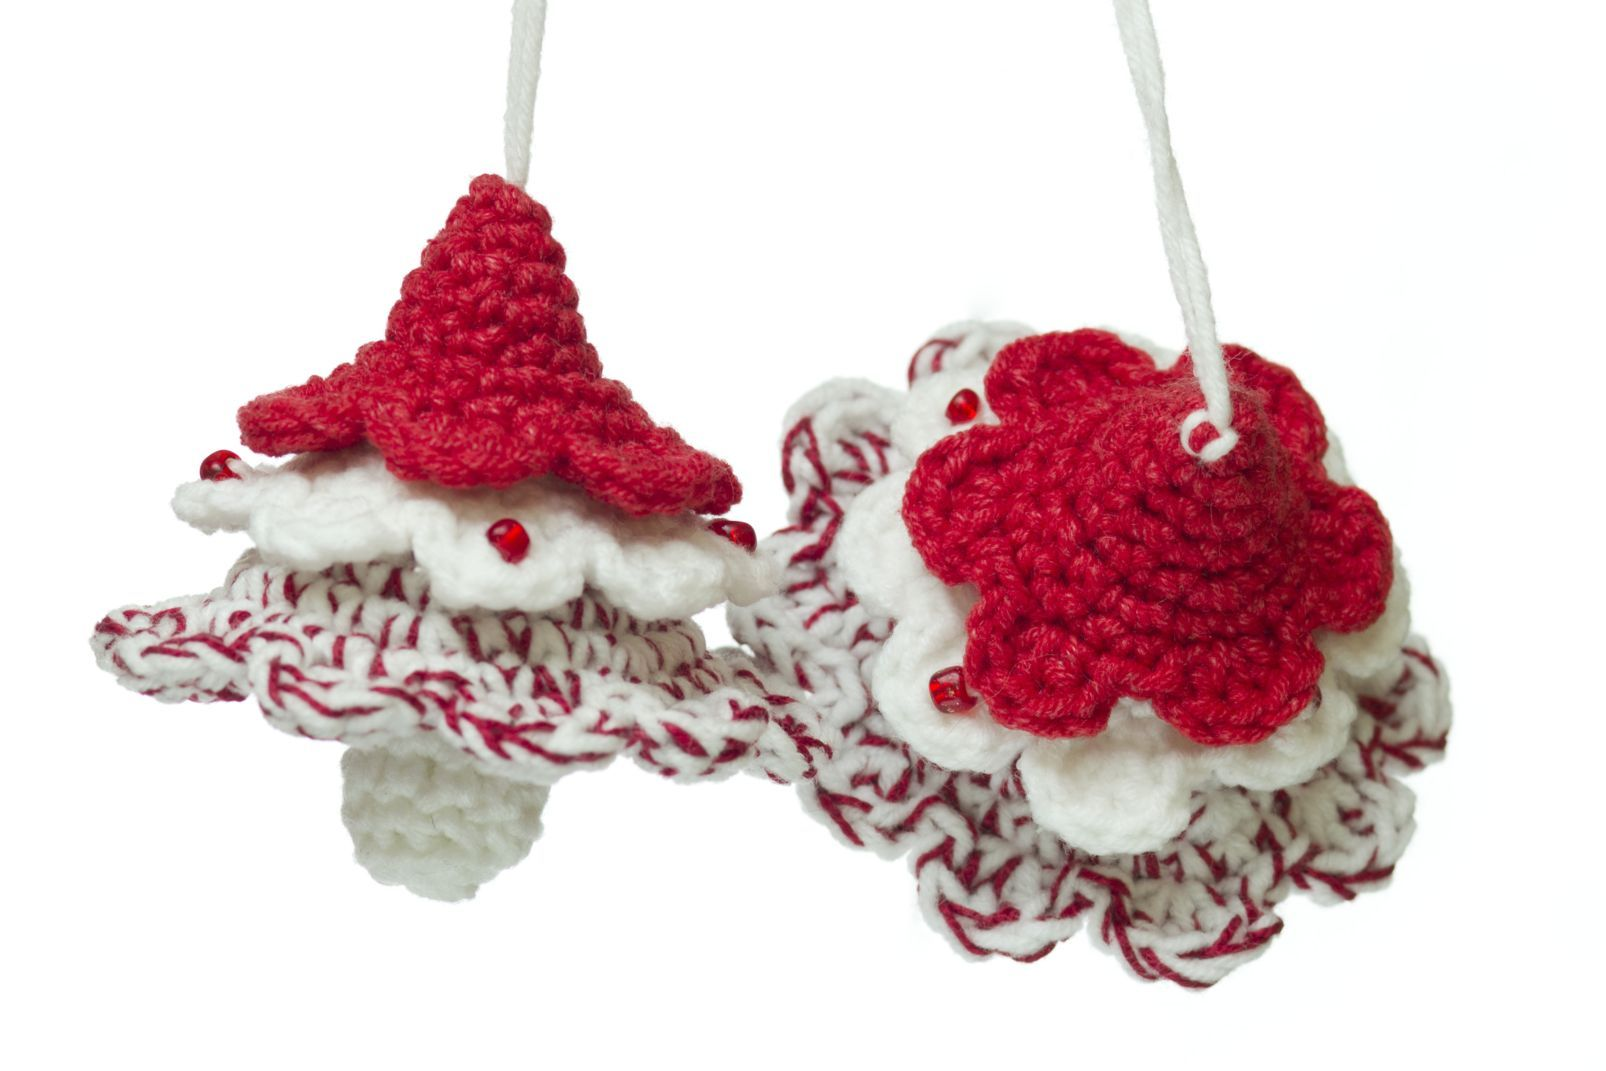 Tutorial De Amigurumis Navideños : Crochet christmas tree tutorial crochet time or we could